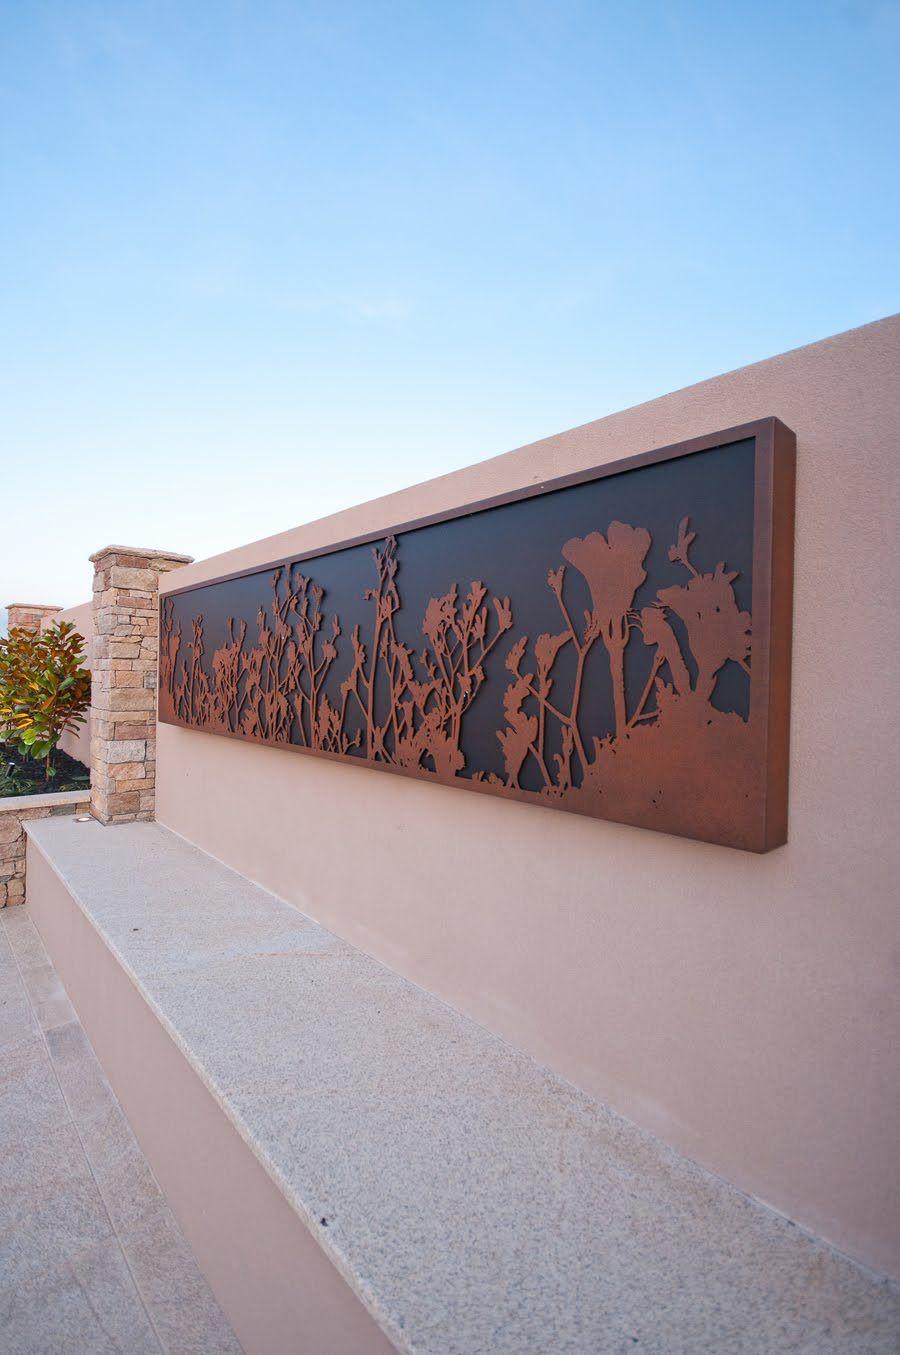 Pin On Sculpture Influence